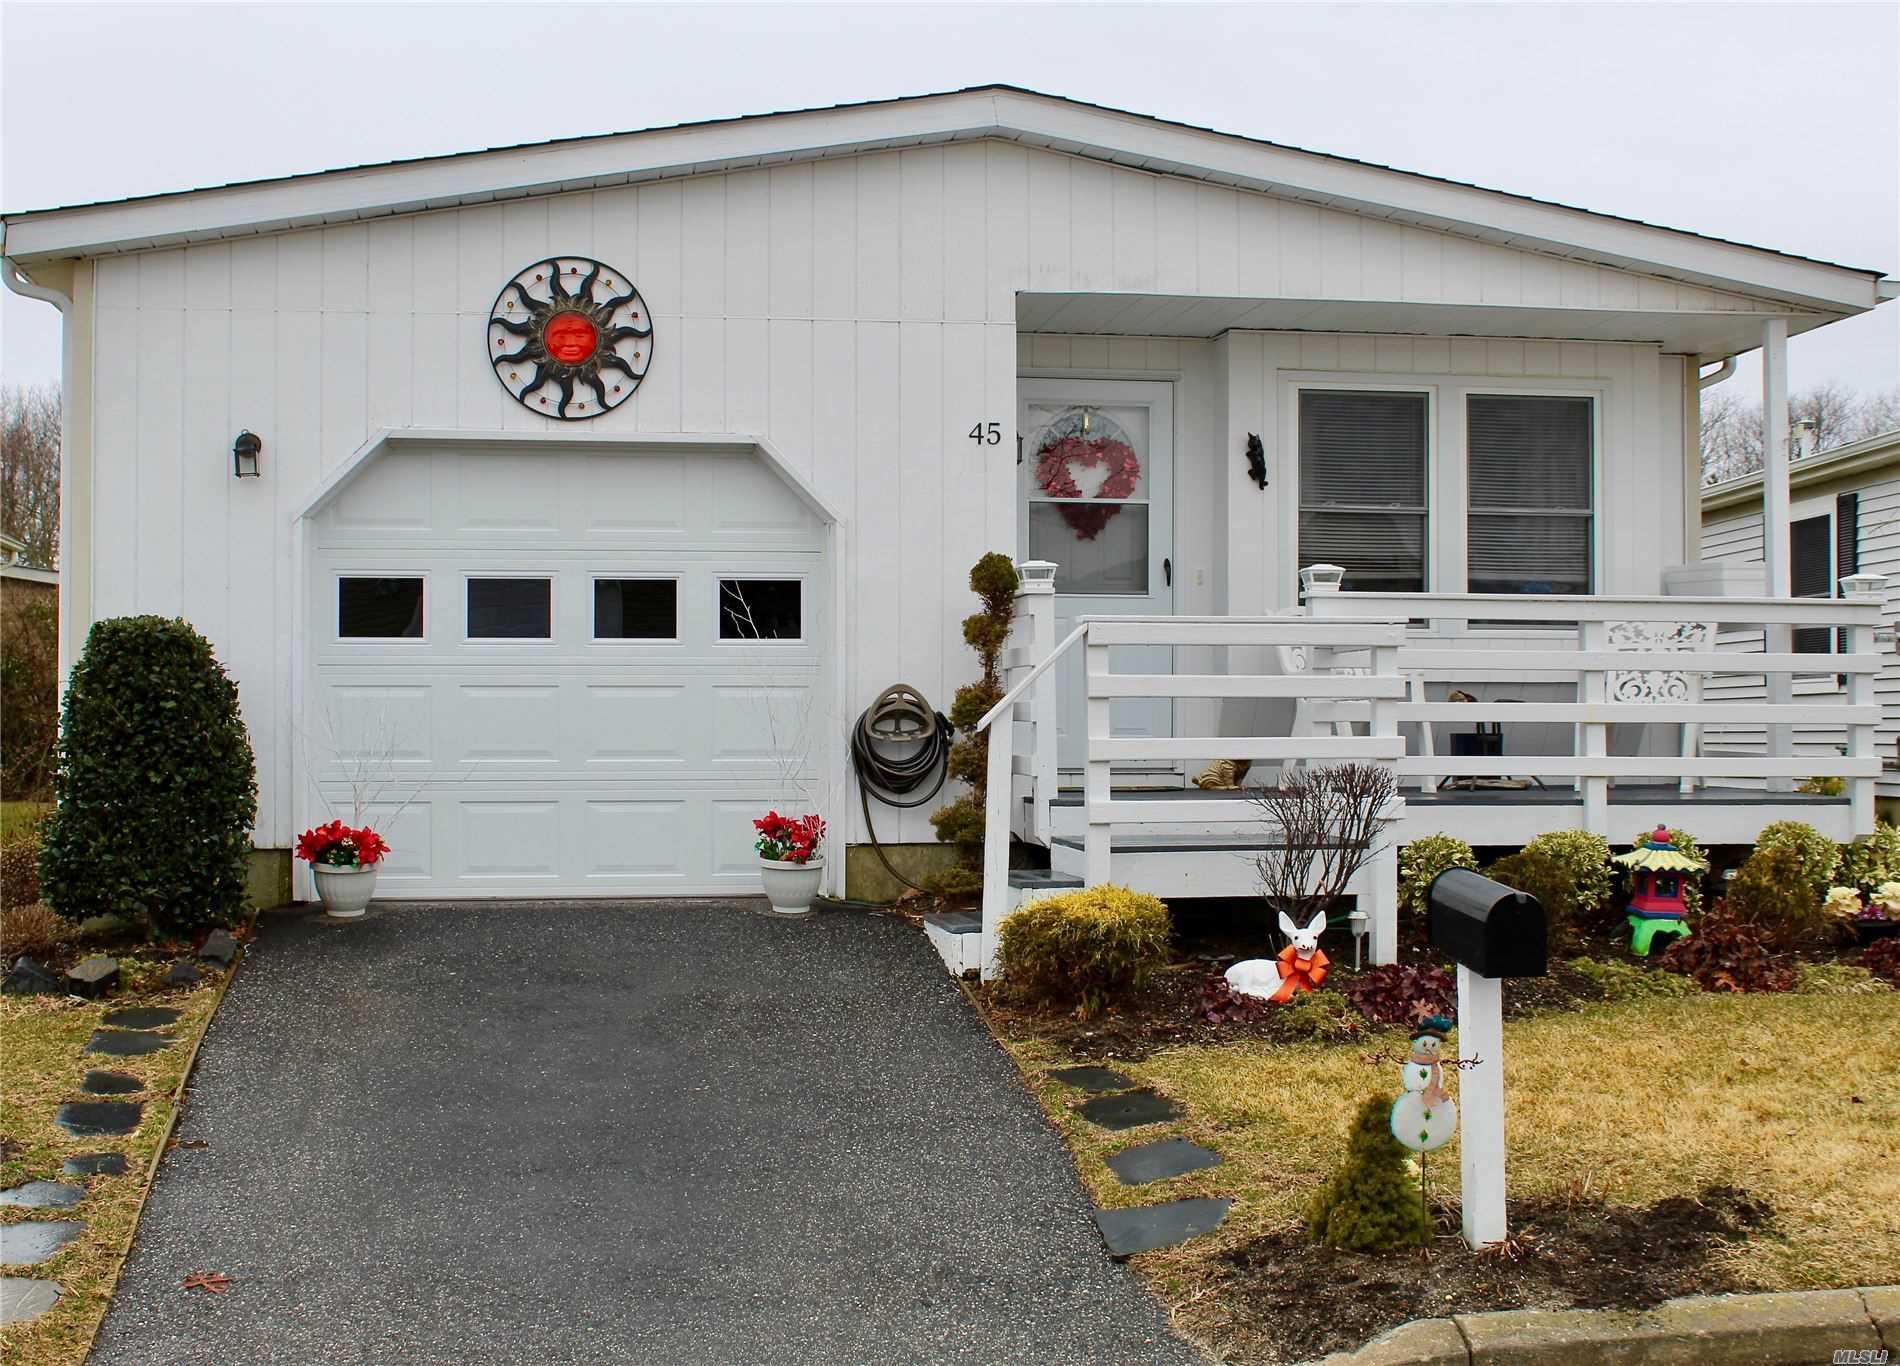 Property for sale at 45 Dogwood Lane, Manorville NY 11949, Manorville,  New York 11949